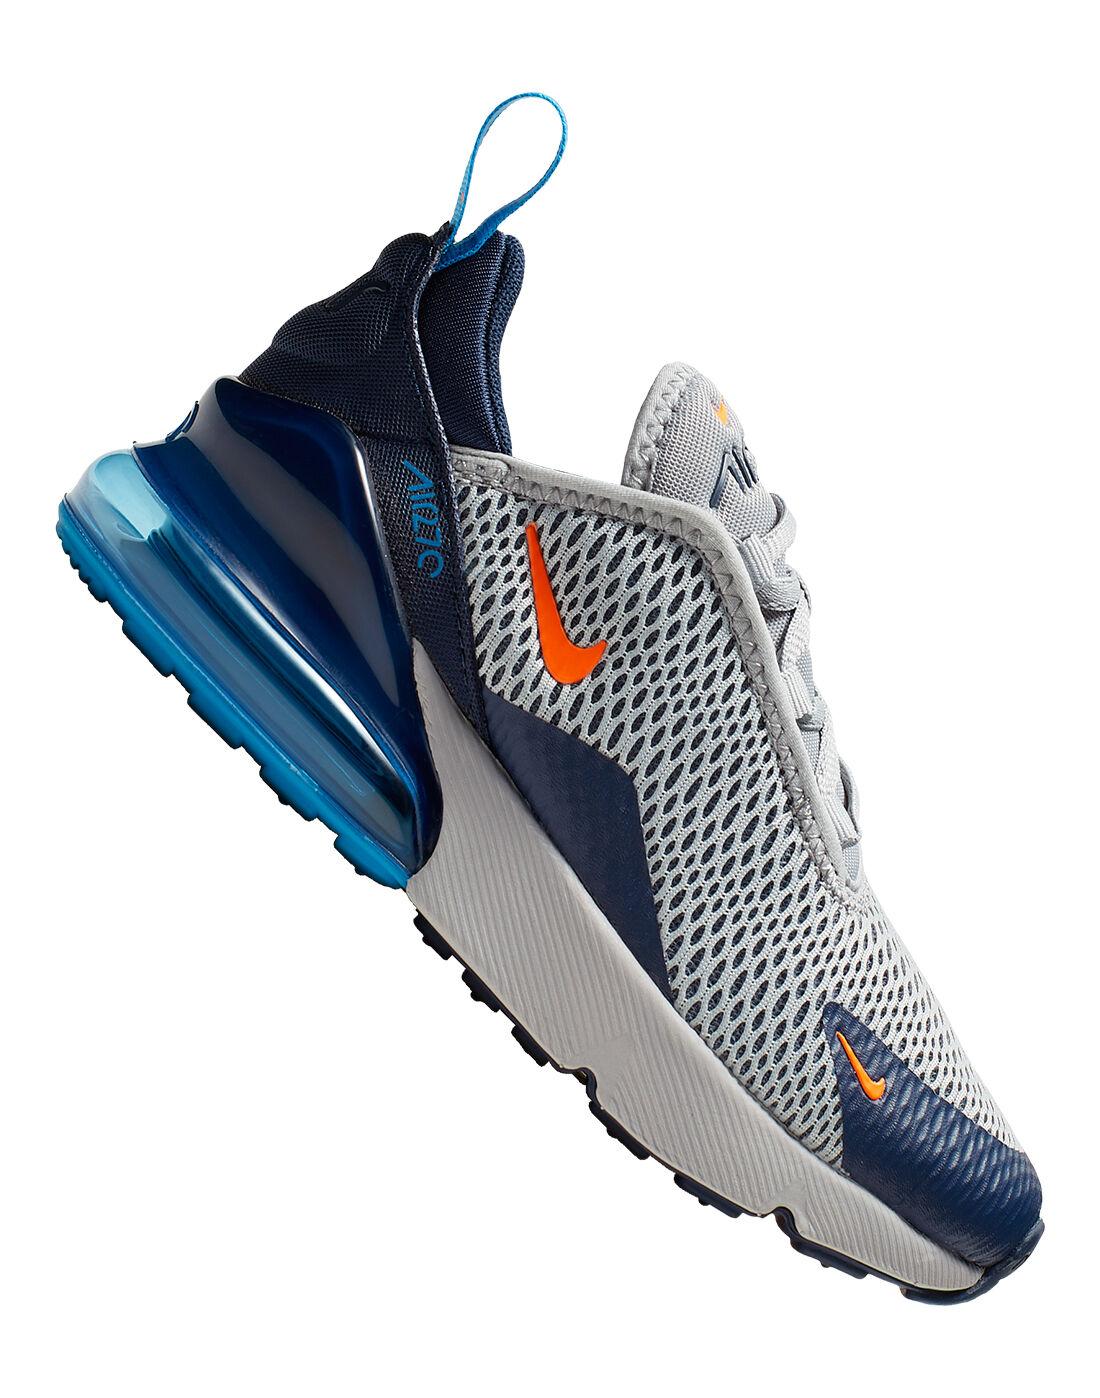 Grey \u0026 Blue Nike Air Max 270